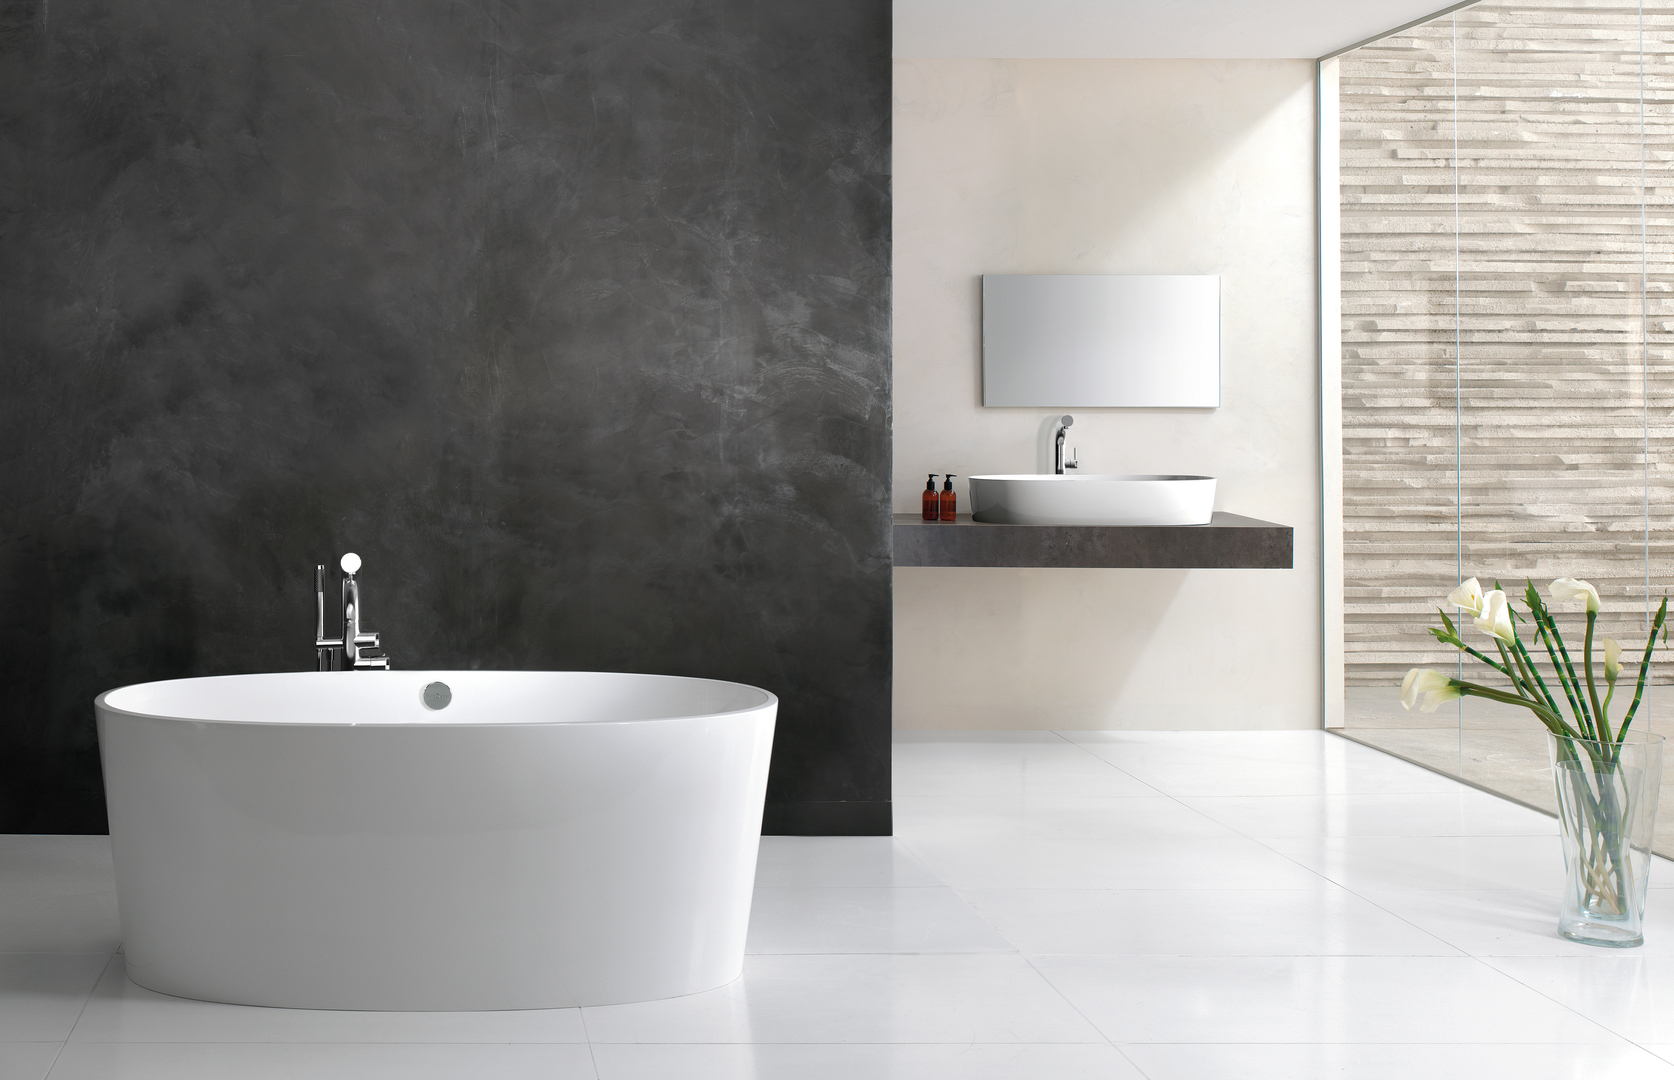 apex plumbing decor  bathroom faucets toilets and tubs kitchen  - bathroom fixtures